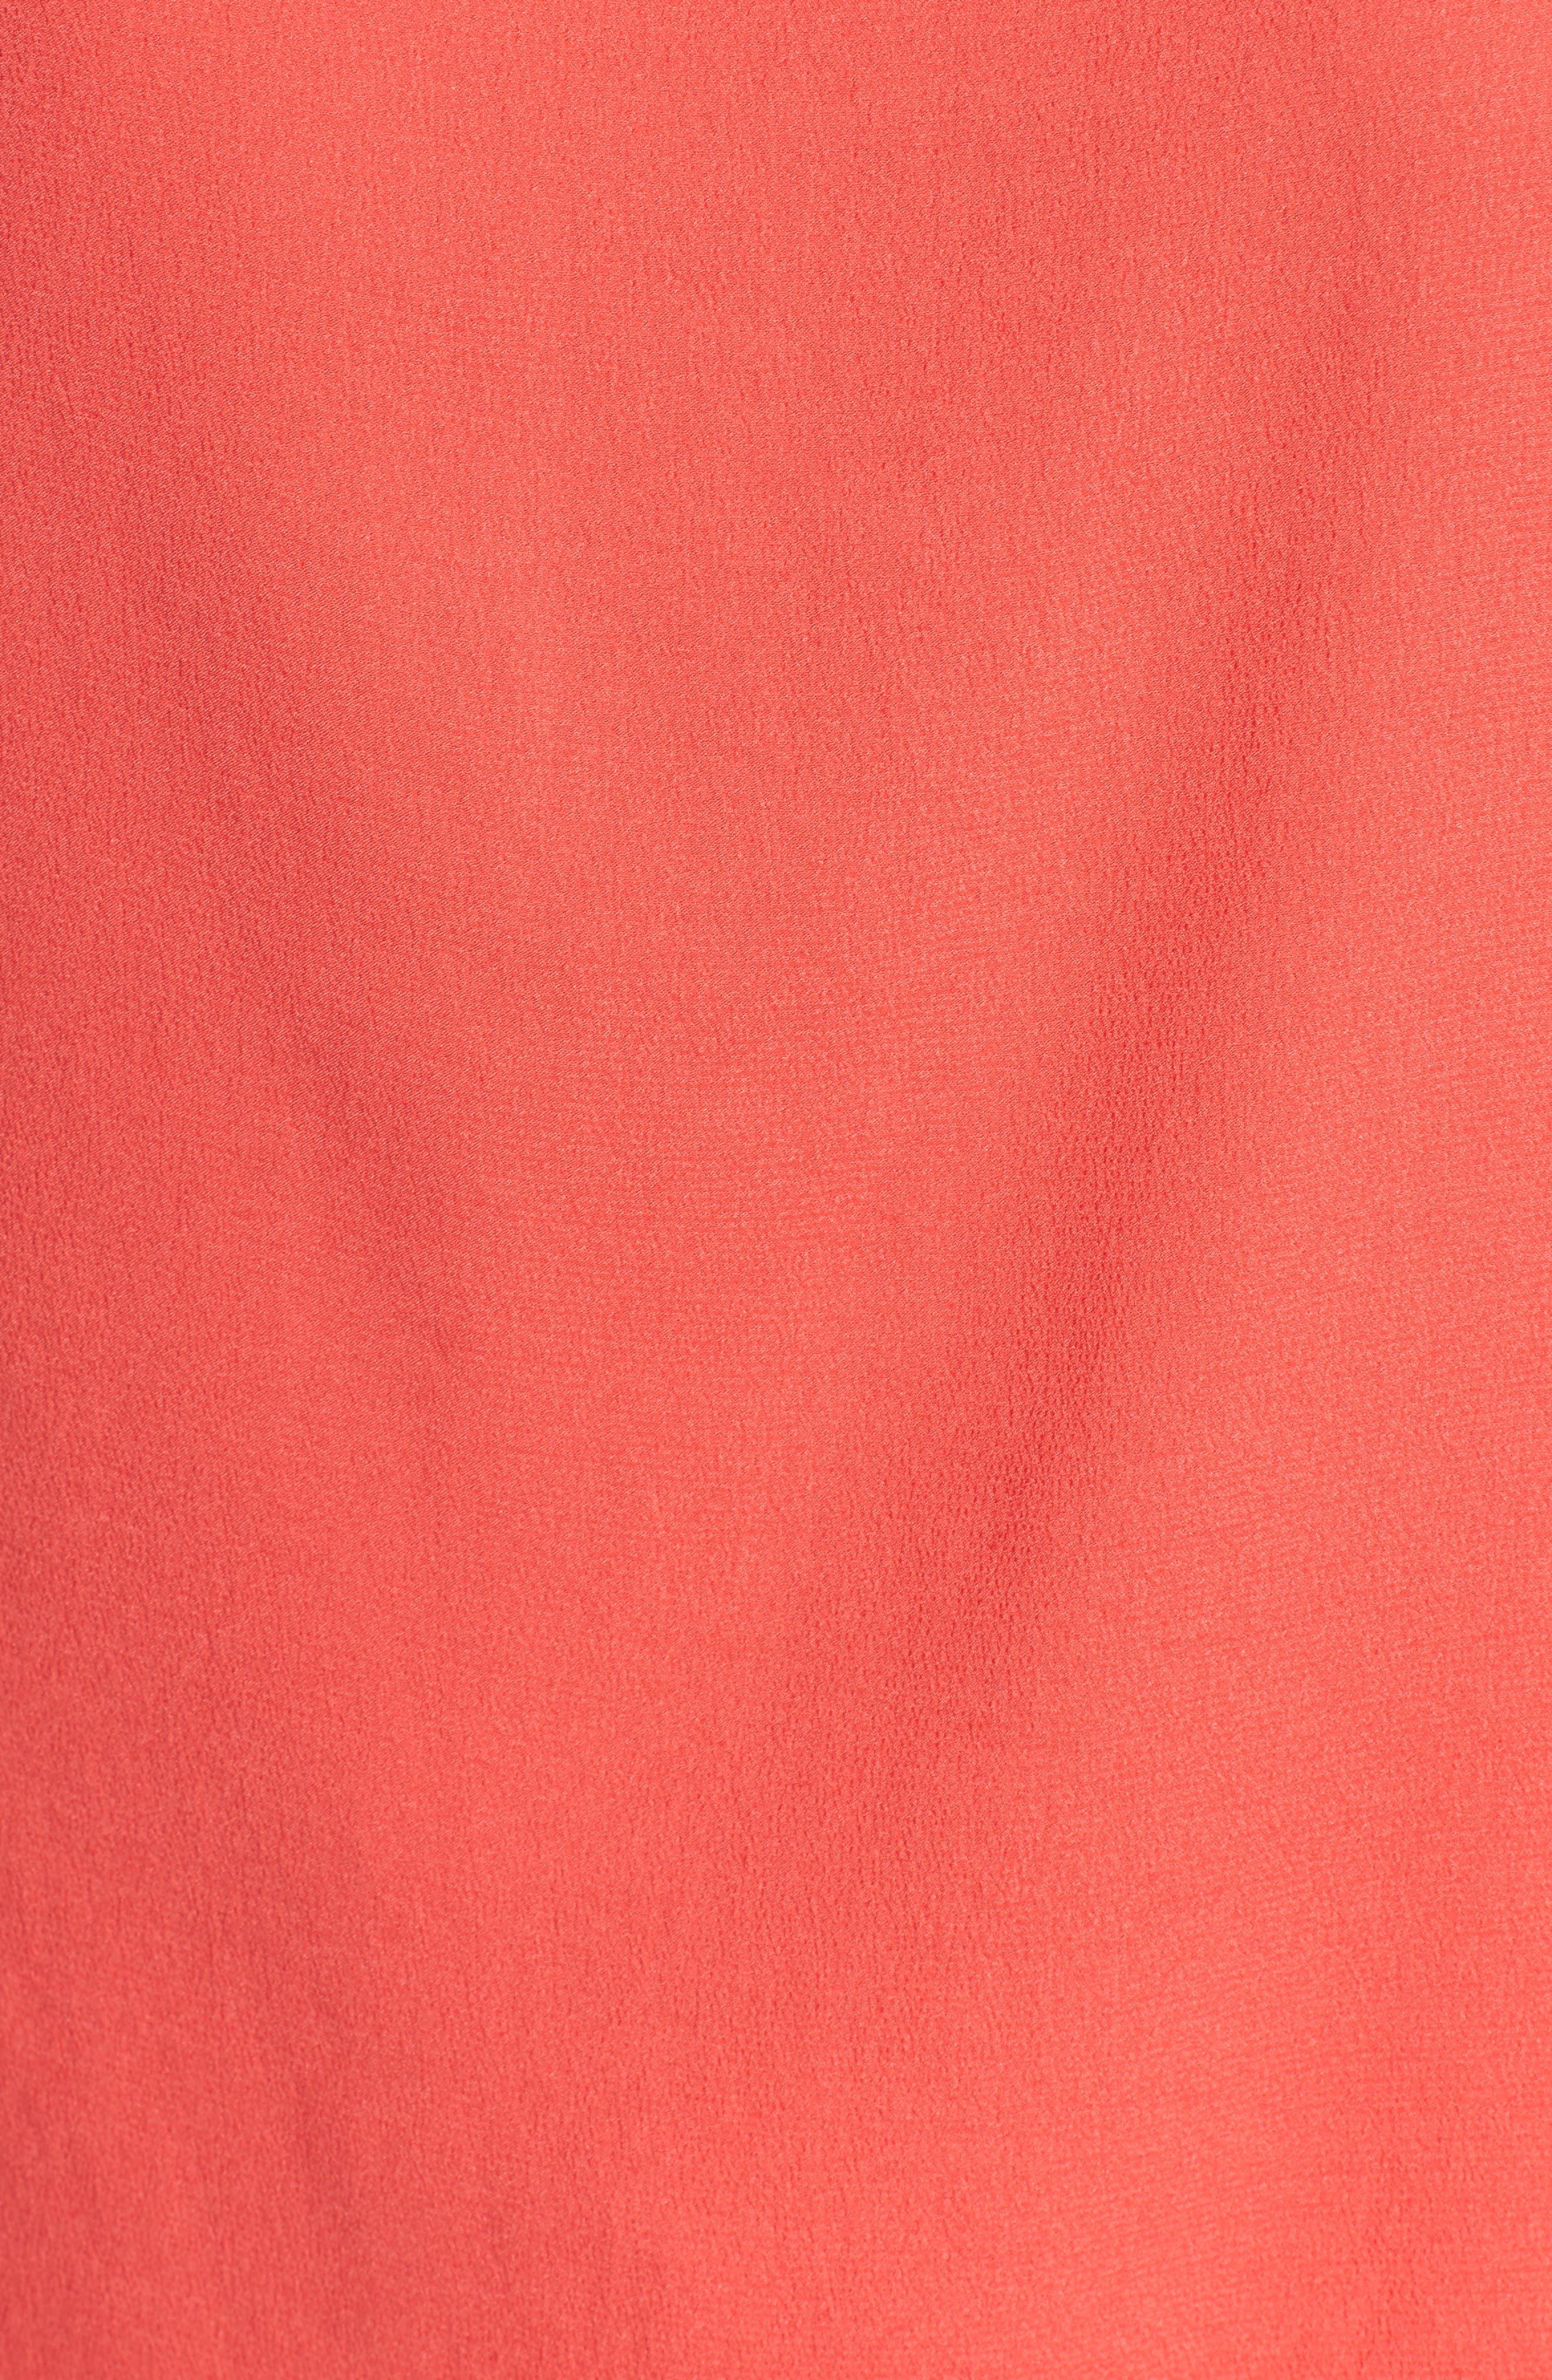 Asymmetrical Shoulder Top,                             Alternate thumbnail 6, color,                             Red Hibiscus